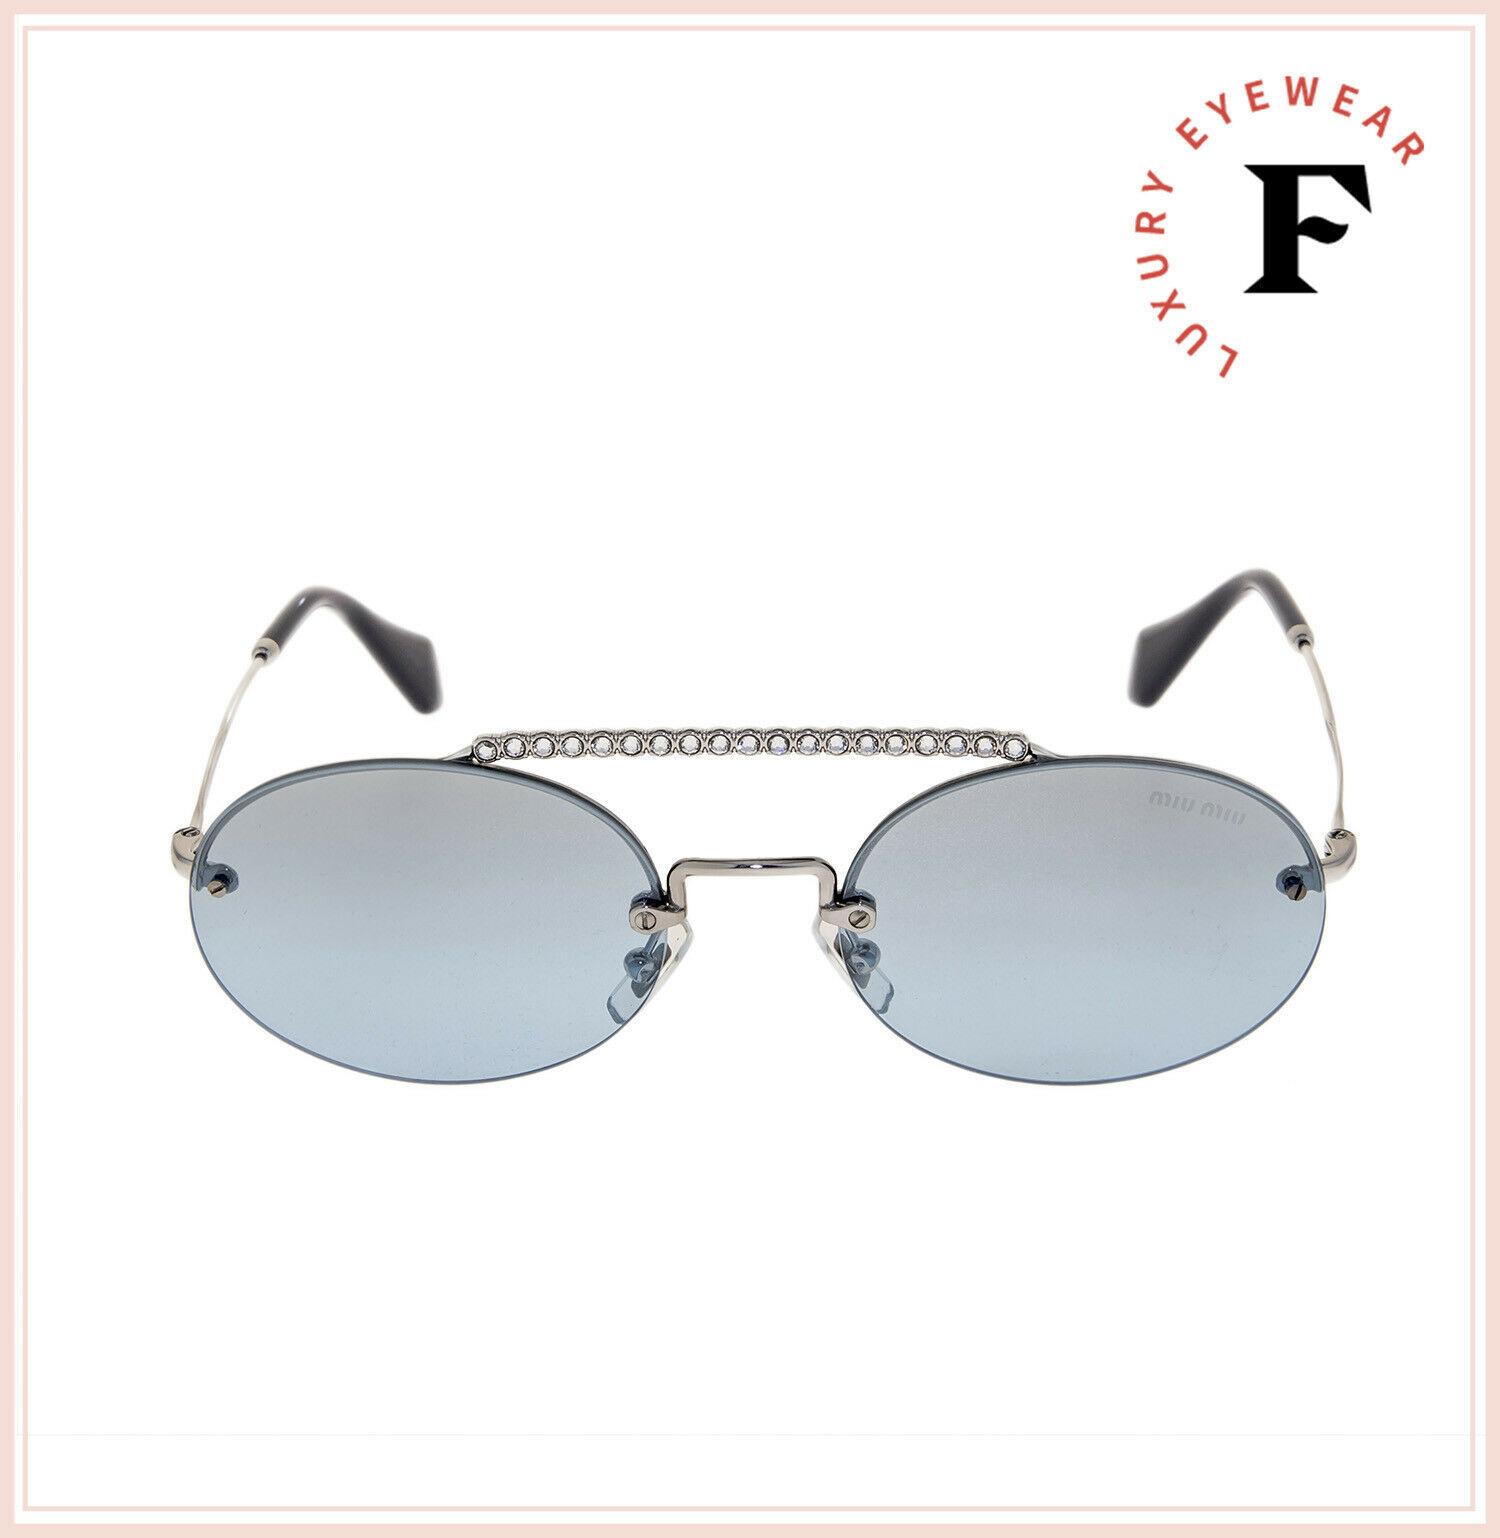 MIU MIU SOCIETE MU60TS CRYSTAL Blue Silver Oval Rimless Special Sunglasses 60T